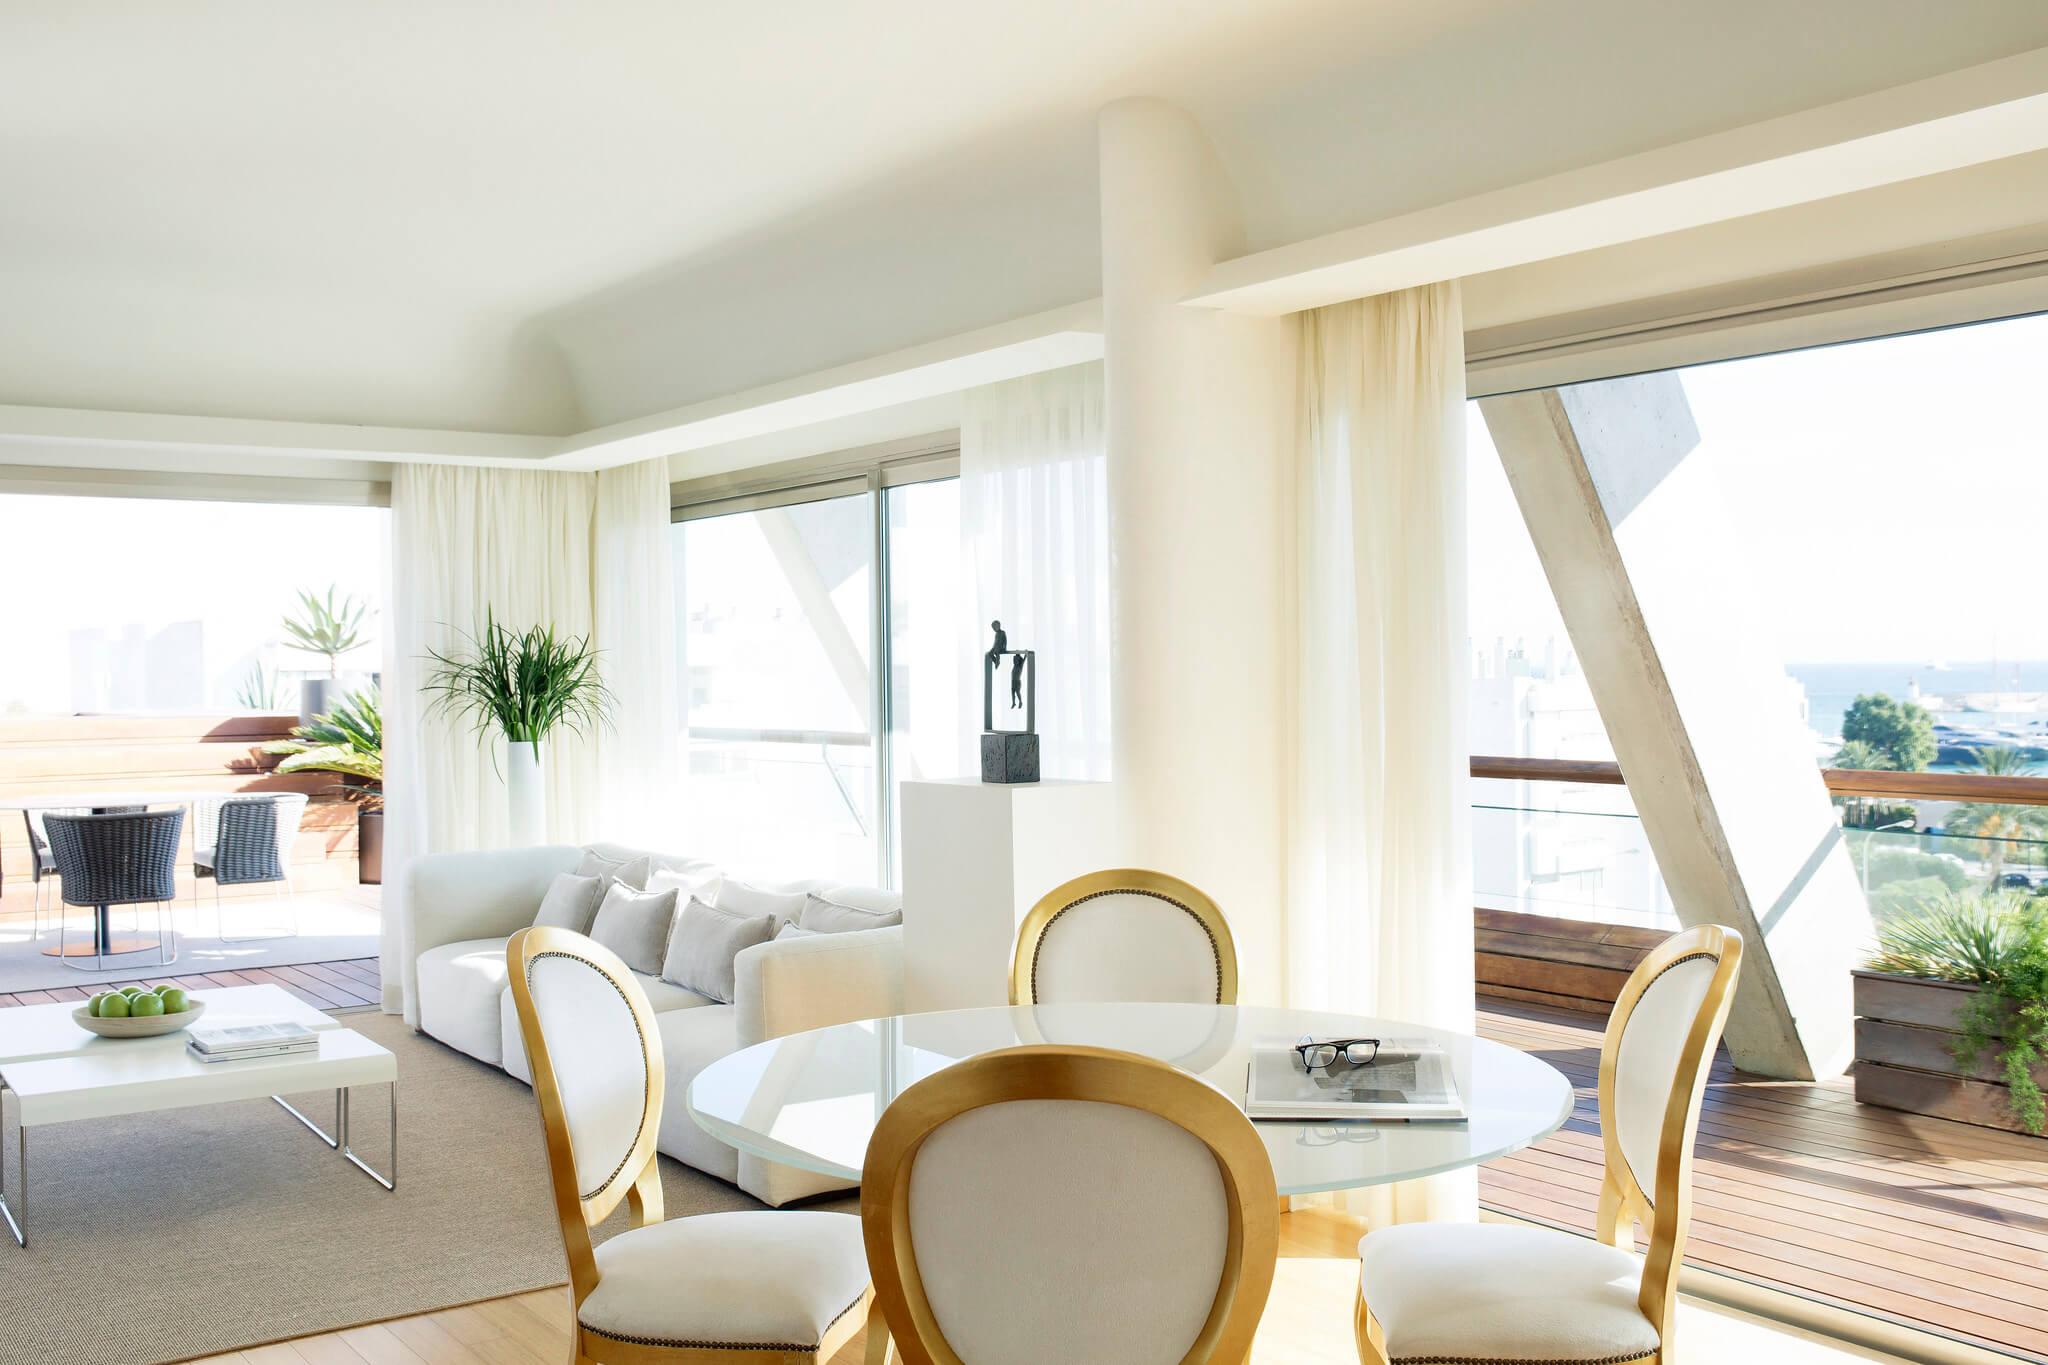 https://www.white-ibiza.com/wp-content/uploads/2020/02/white-ibiza-hotels-ibiza-gran-hotel-2020-03.jpg